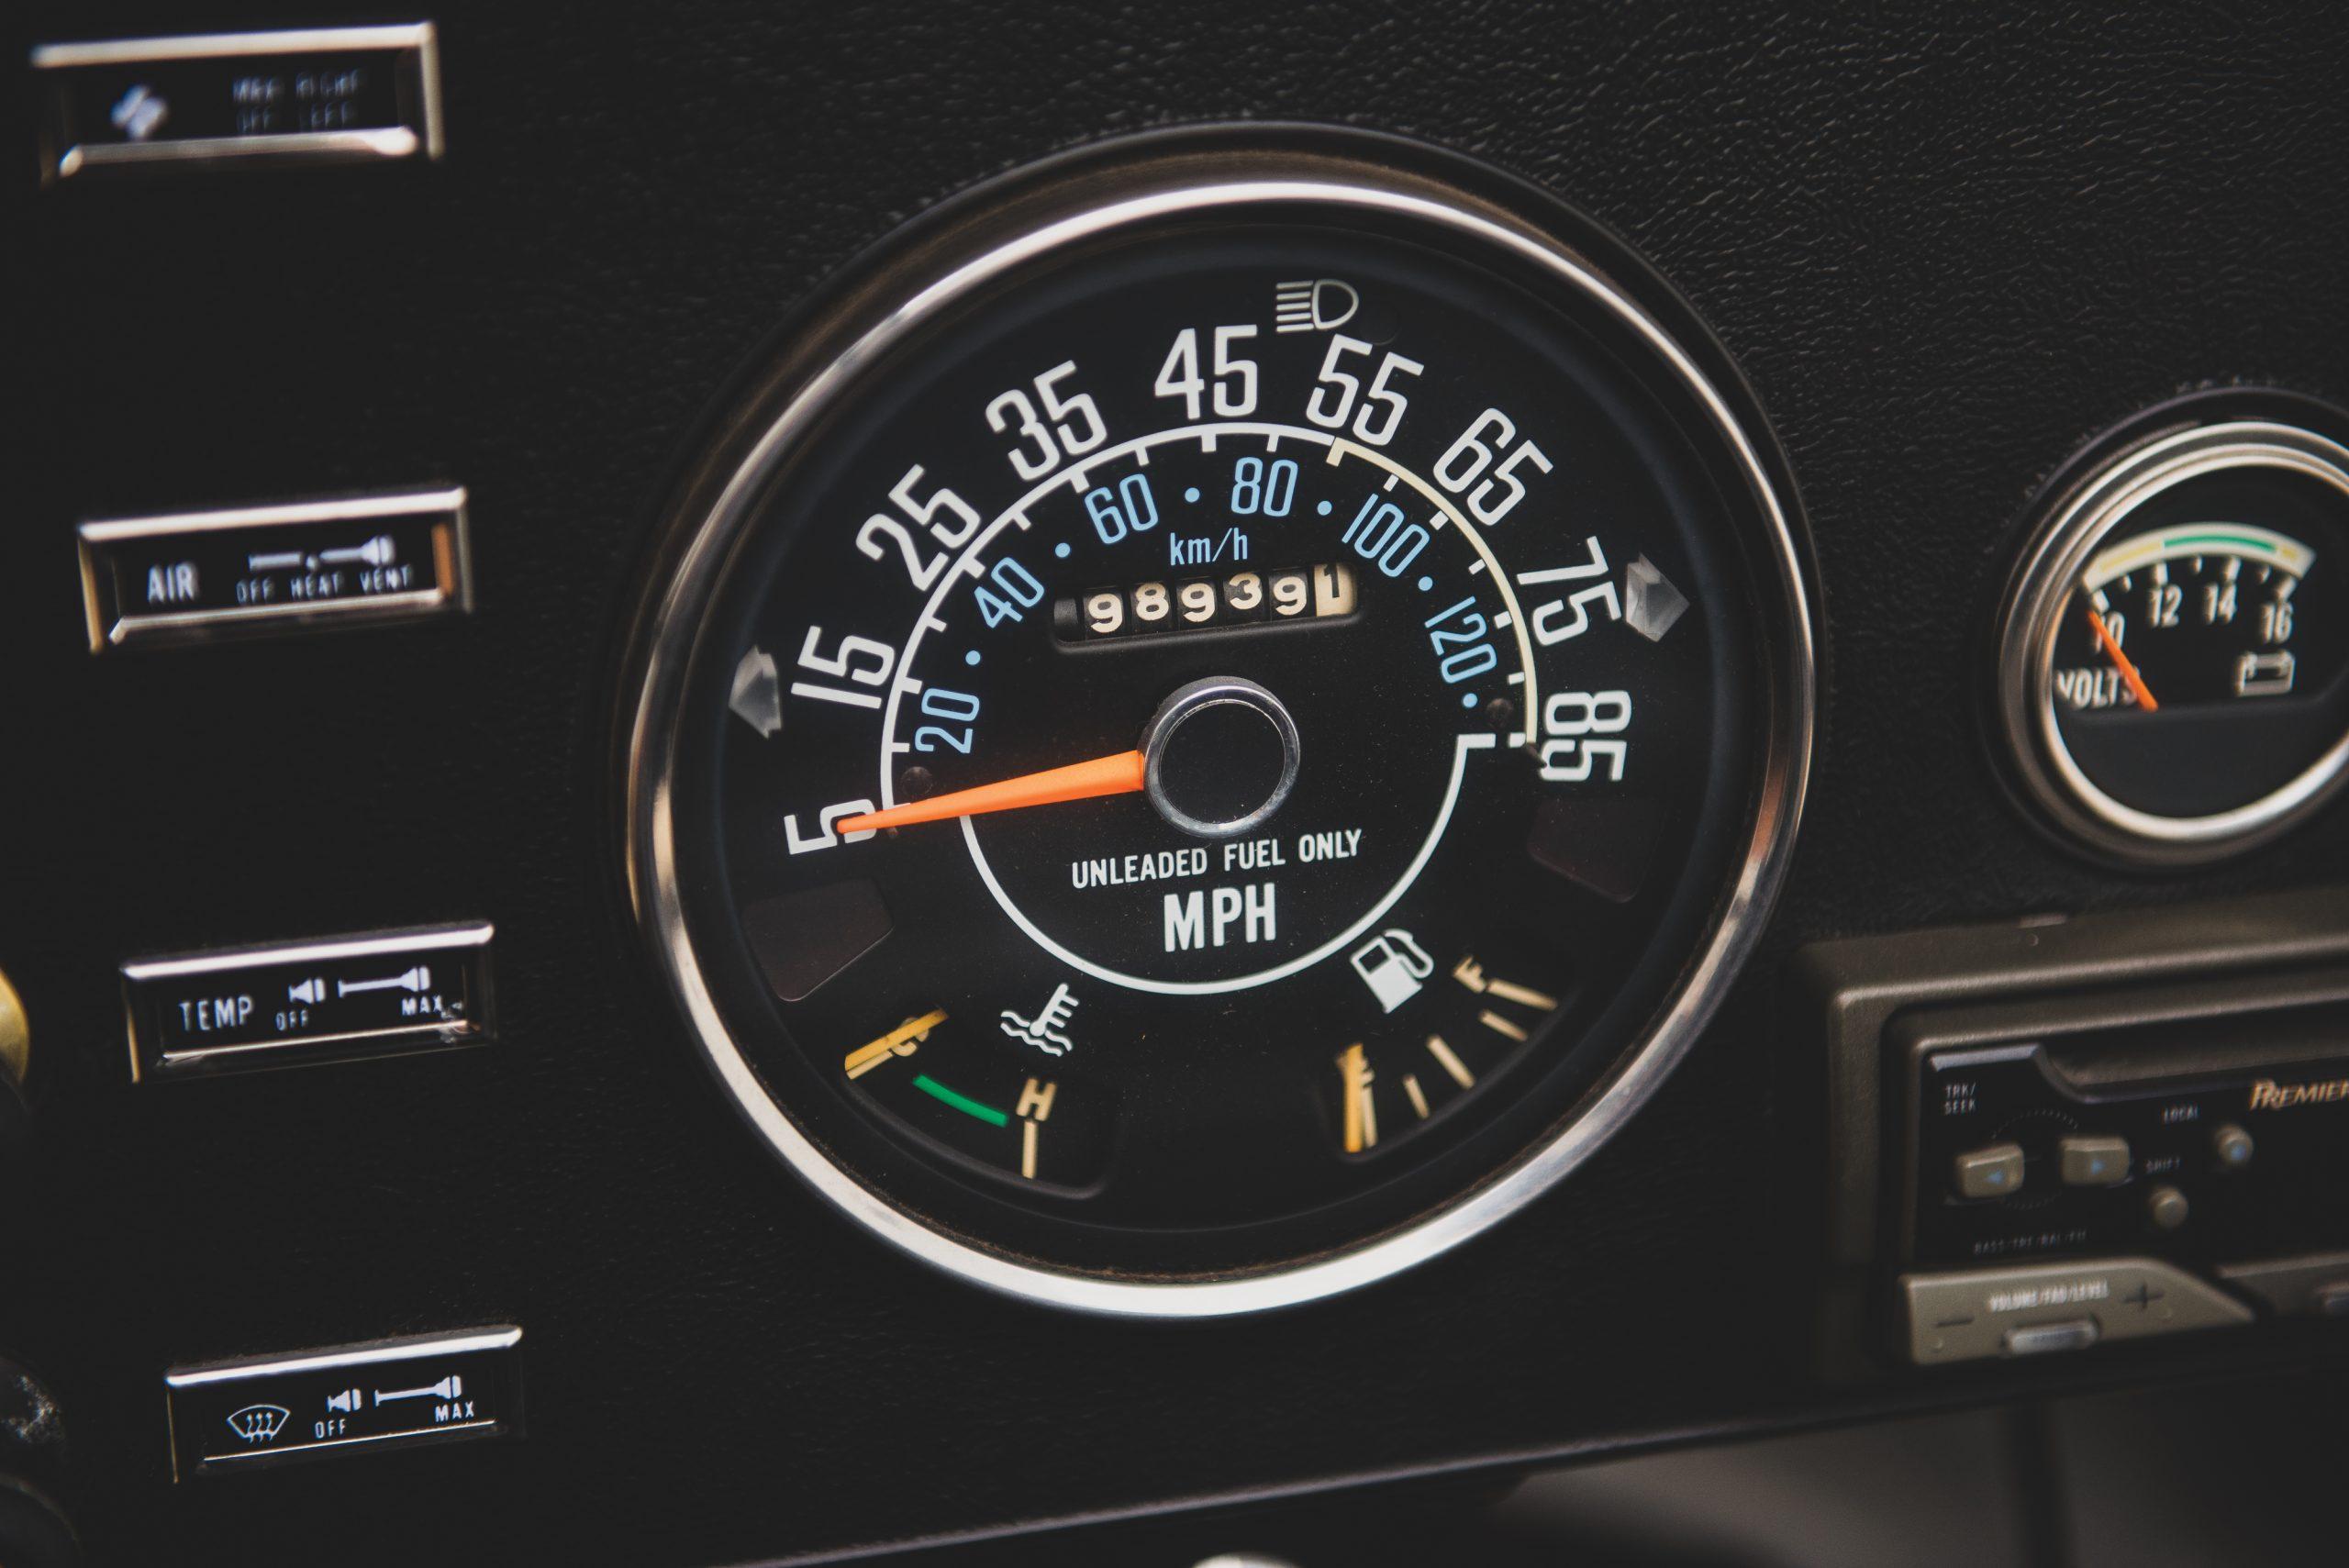 Jeep CJ7 Renegade dash speedo detail